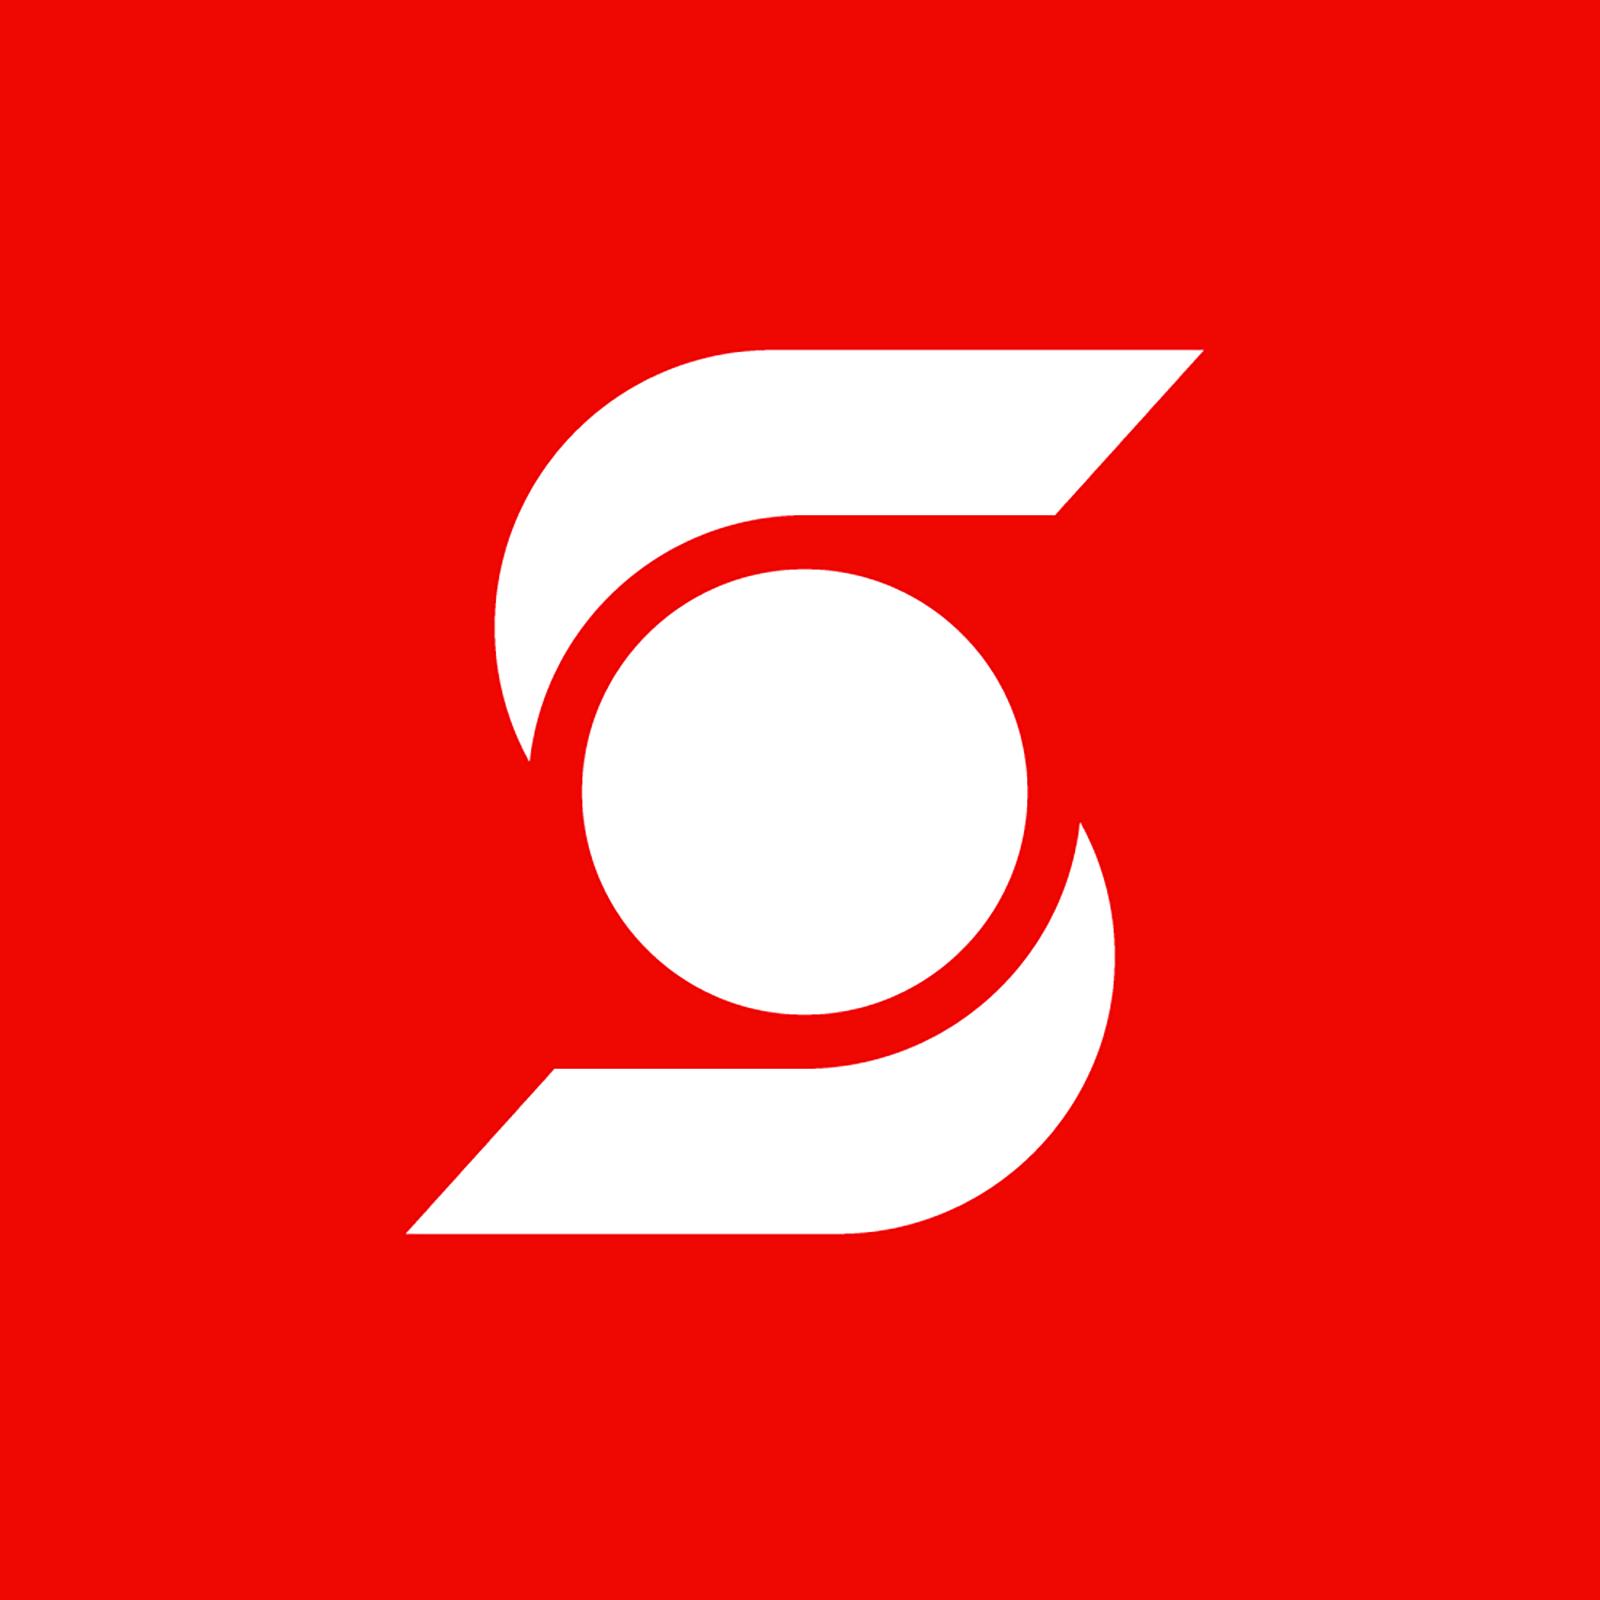 Scotiabank啟用全新的品牌logo和VI視覺形象設計-深圳VI設計4